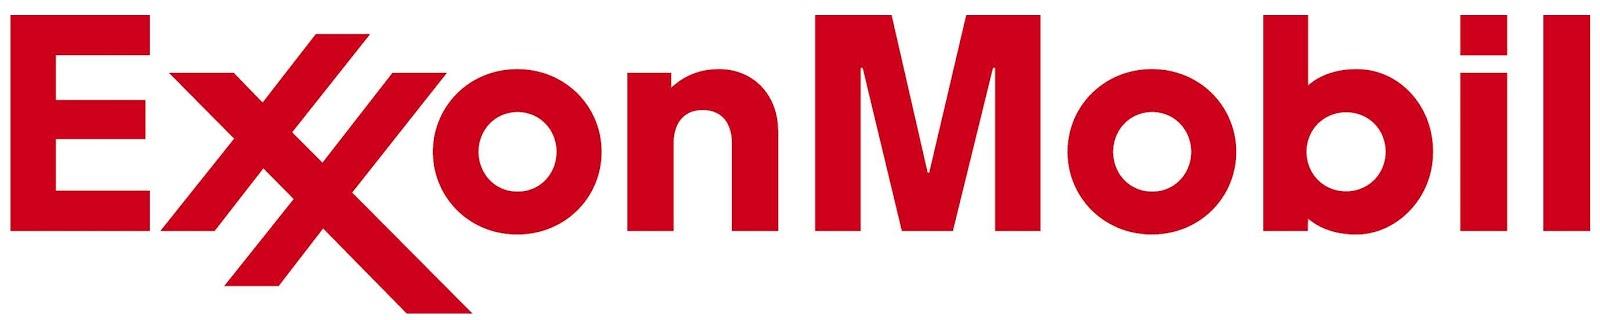 Mizafirzana exxonmobil special internship scholarship for Mobil logo